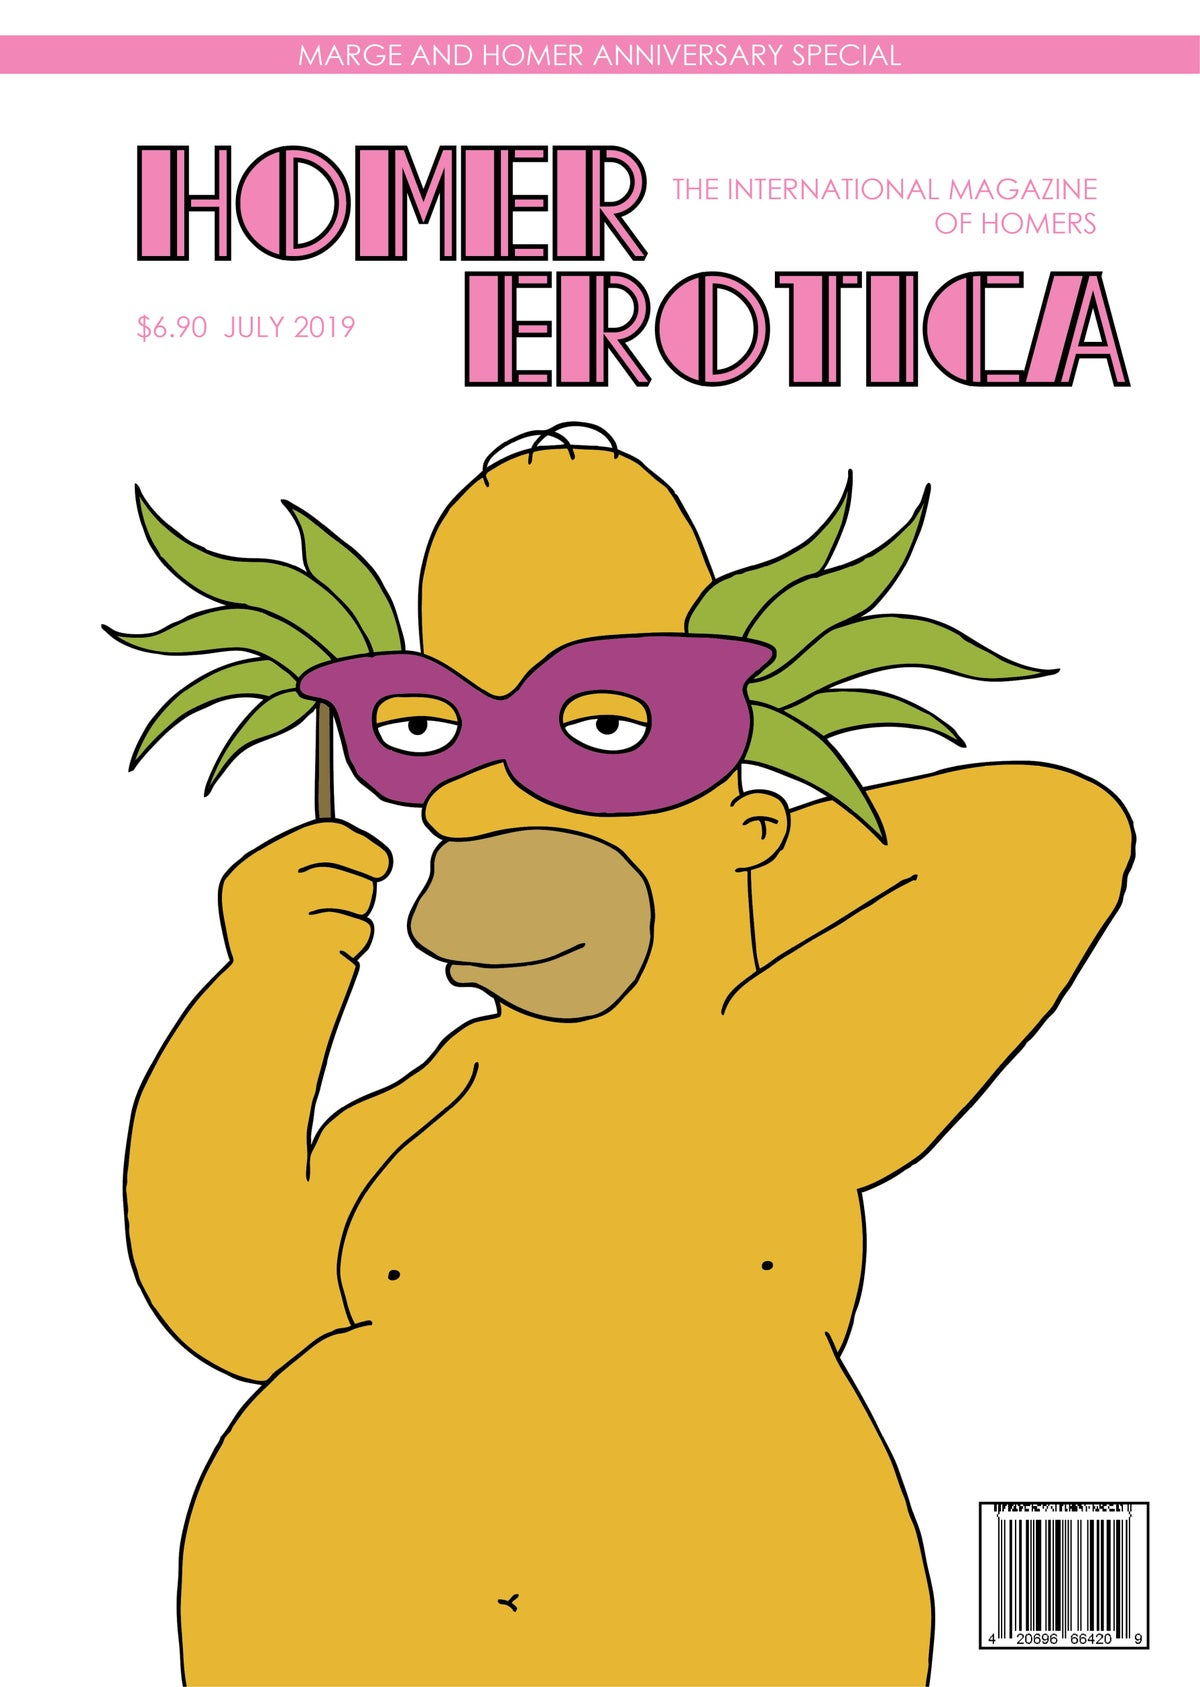 Image of Homer Erotica poster